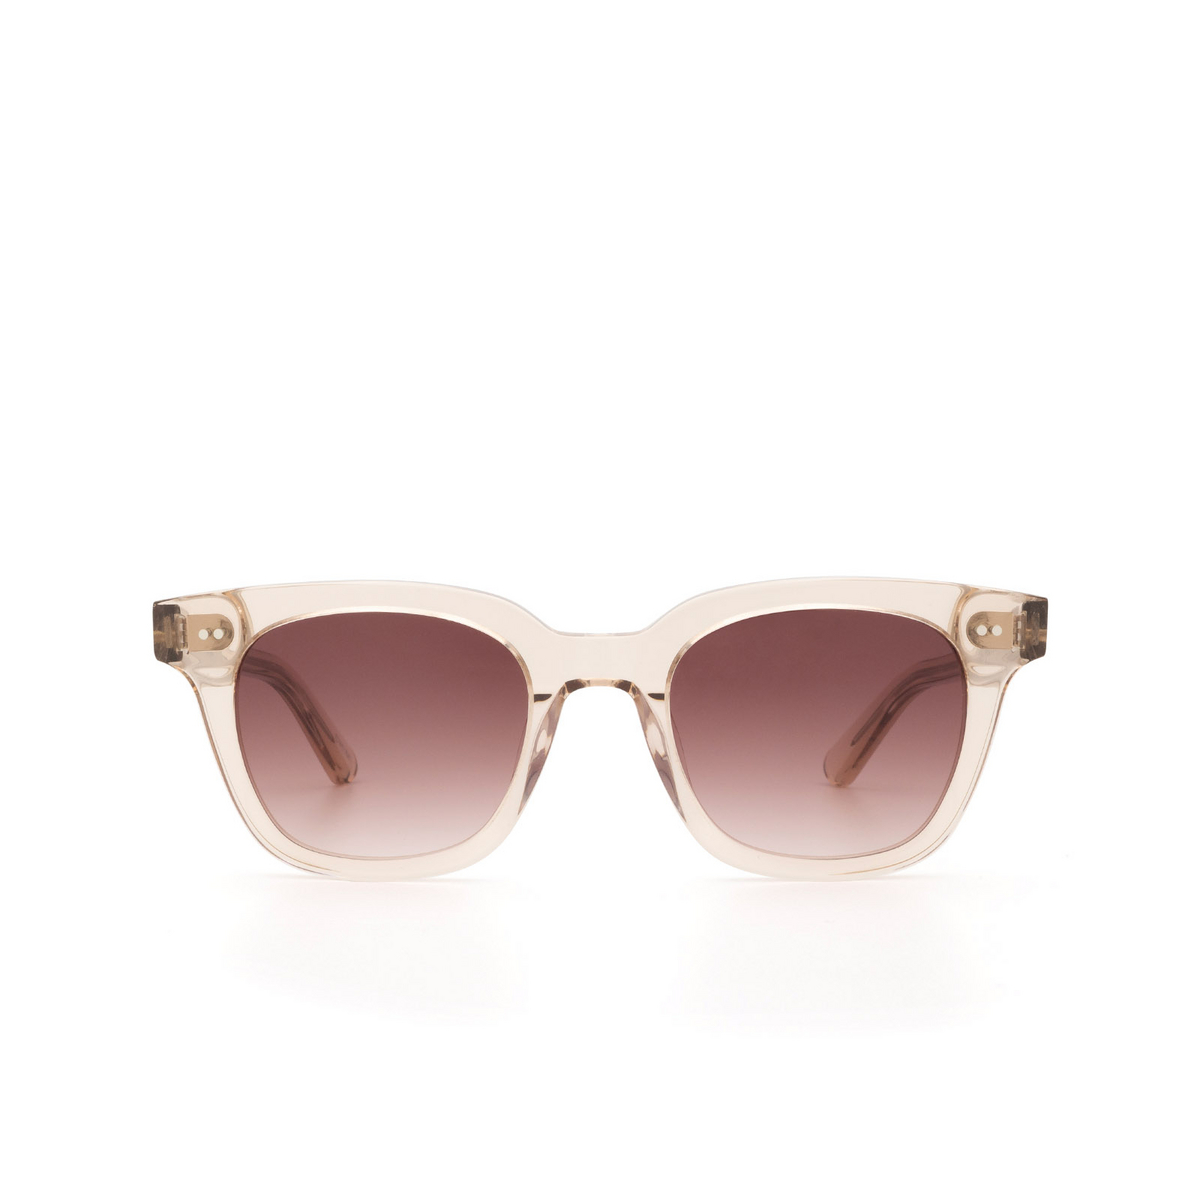 Chimi® Square Sunglasses: #101 color Light Beige Ecru - front view.